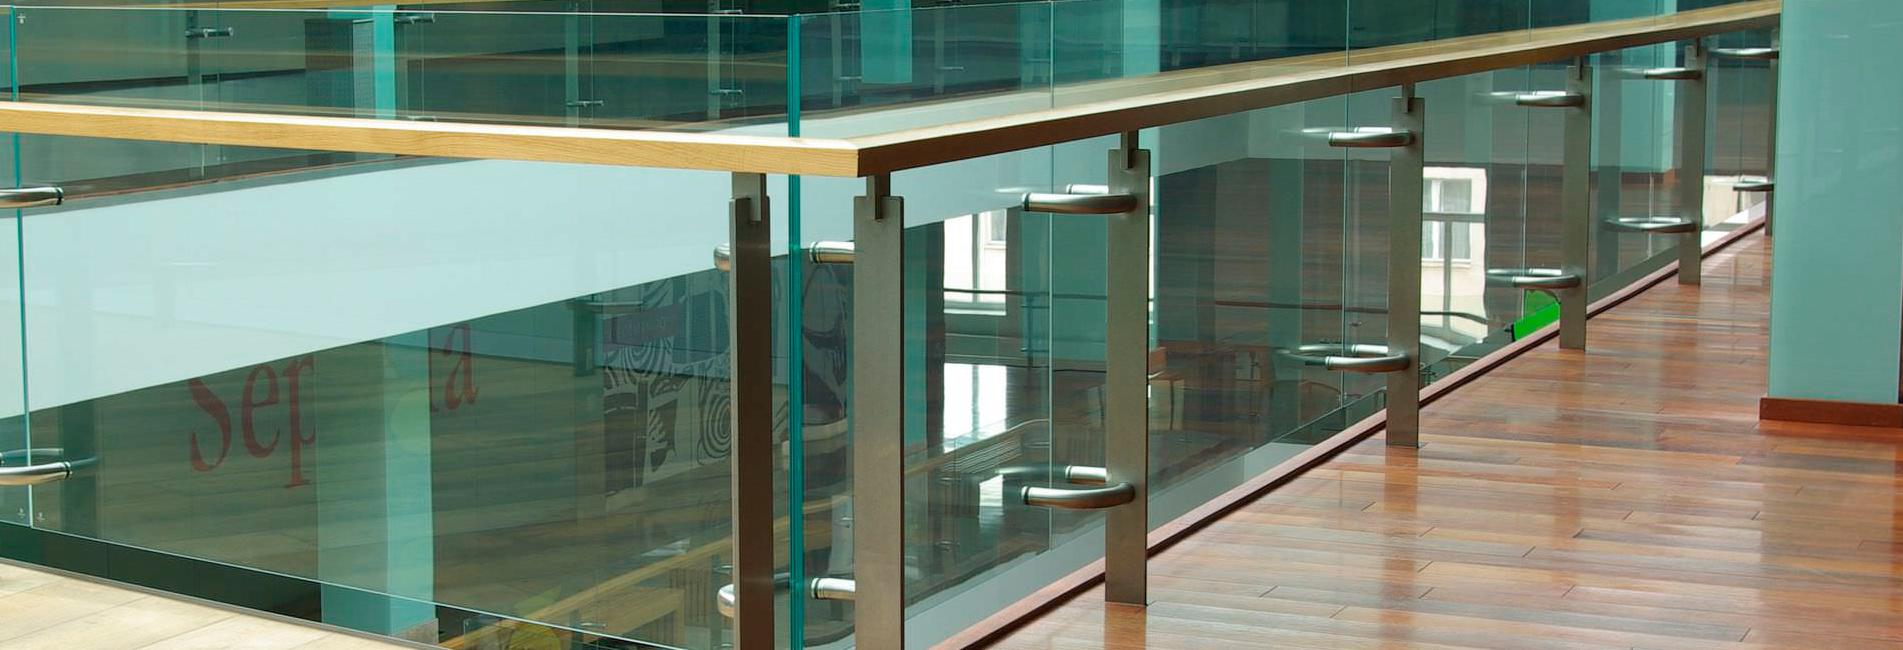 glassrailsystems